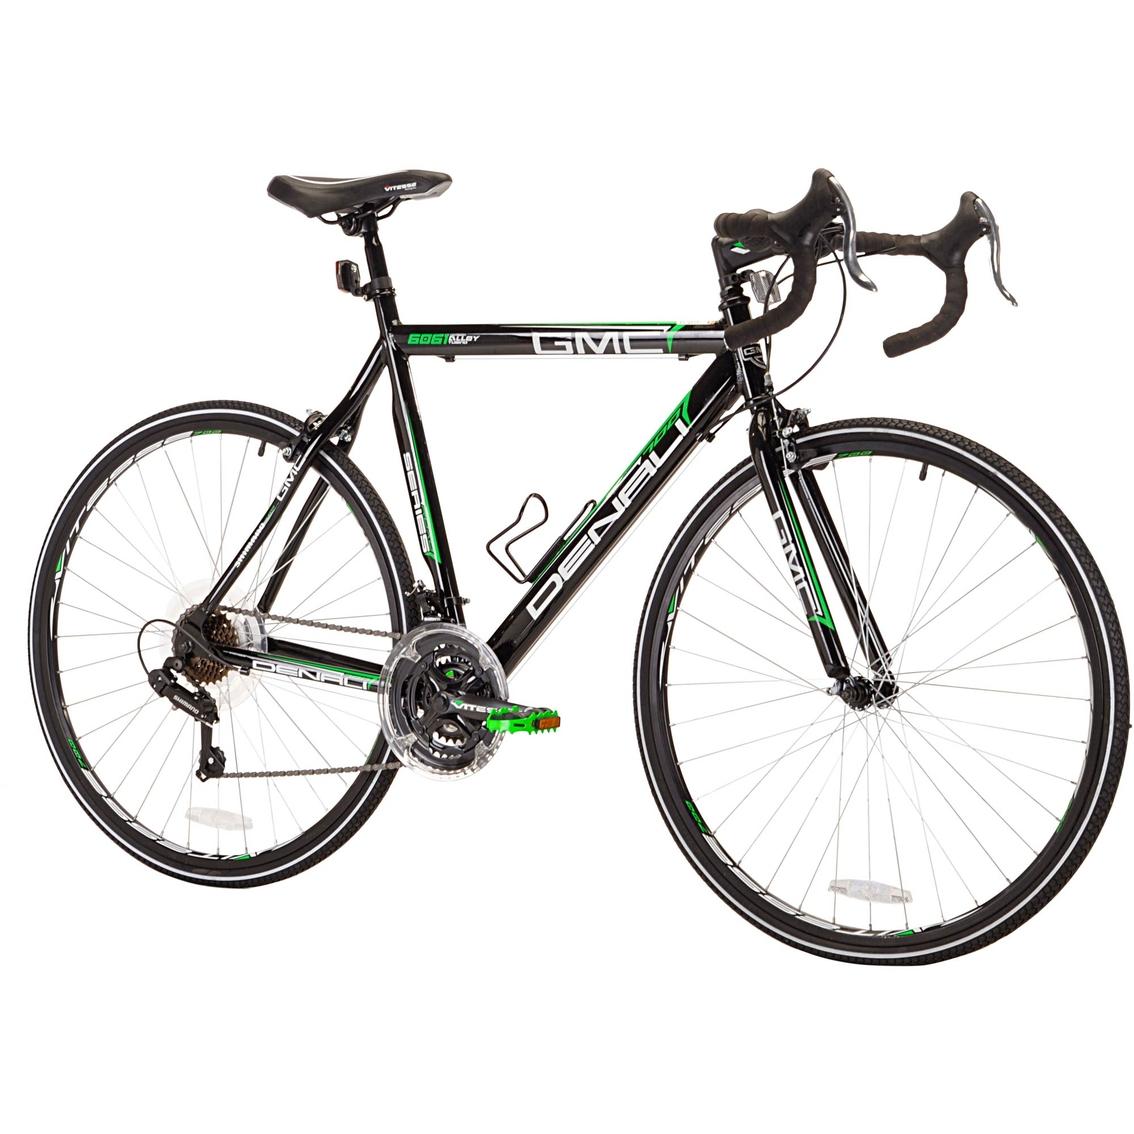 Kent Men S Gmc Denali 700c Large Road Bicycle Adult Bikes Sports Outdoors Shop The Exchange